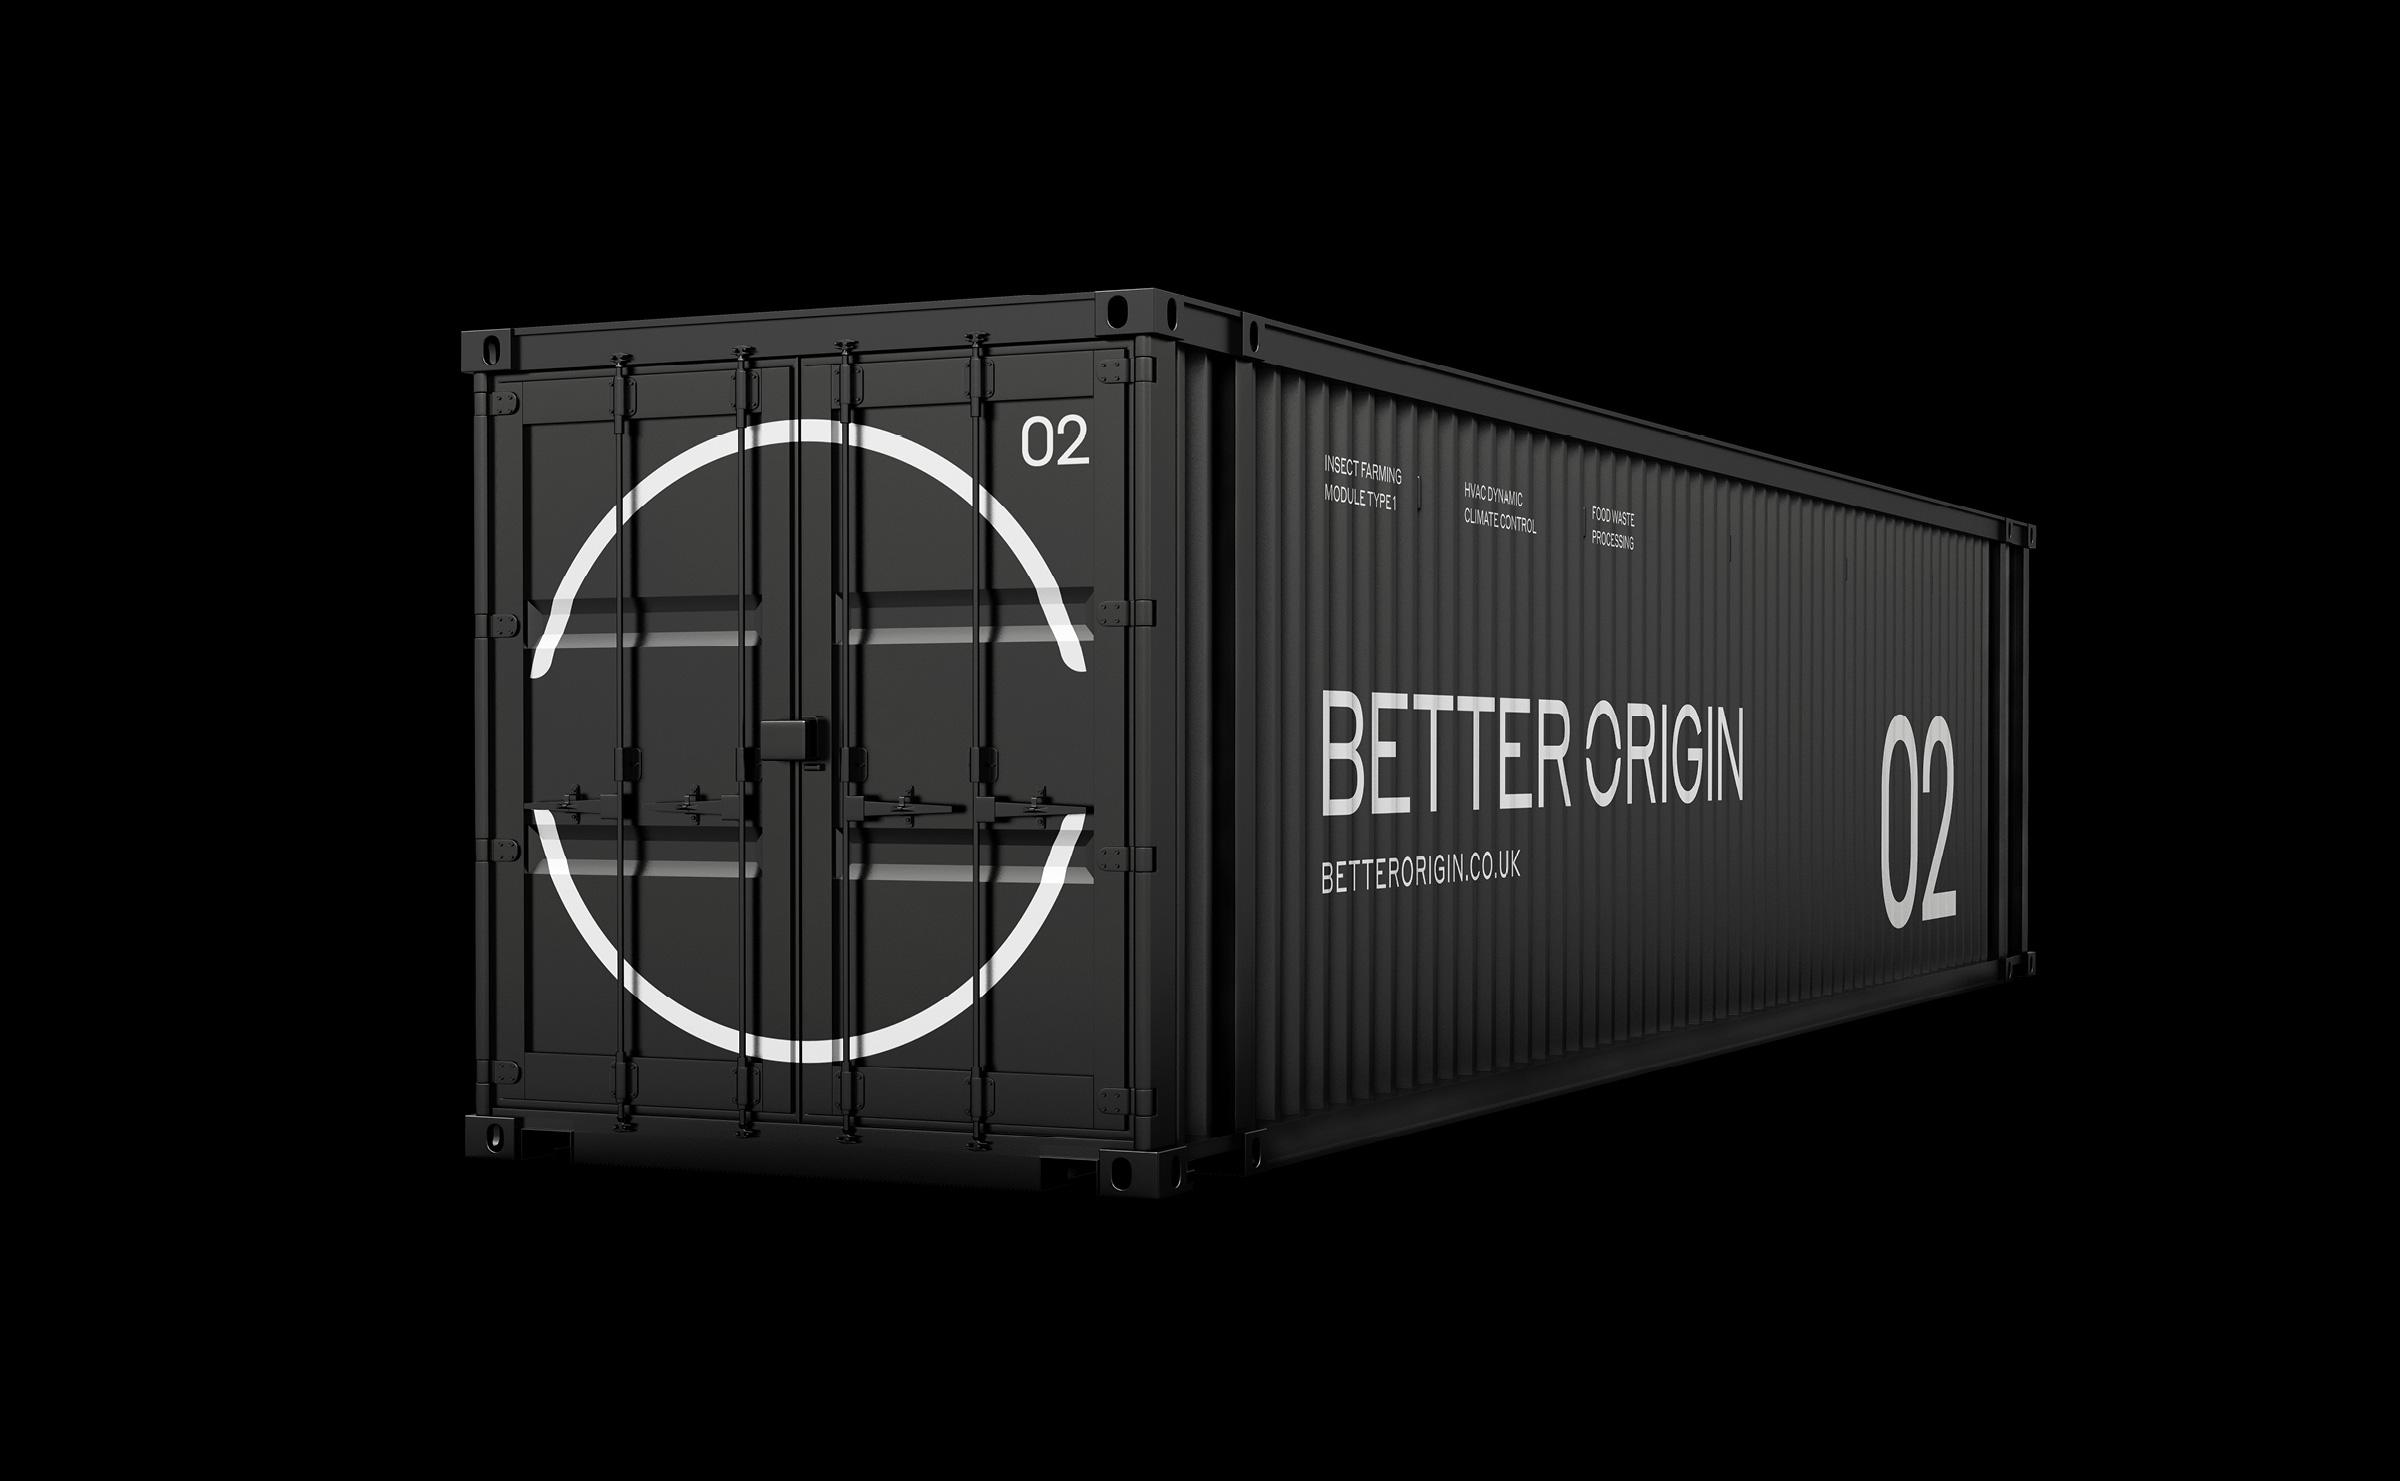 Better_origin__brand_identity_container